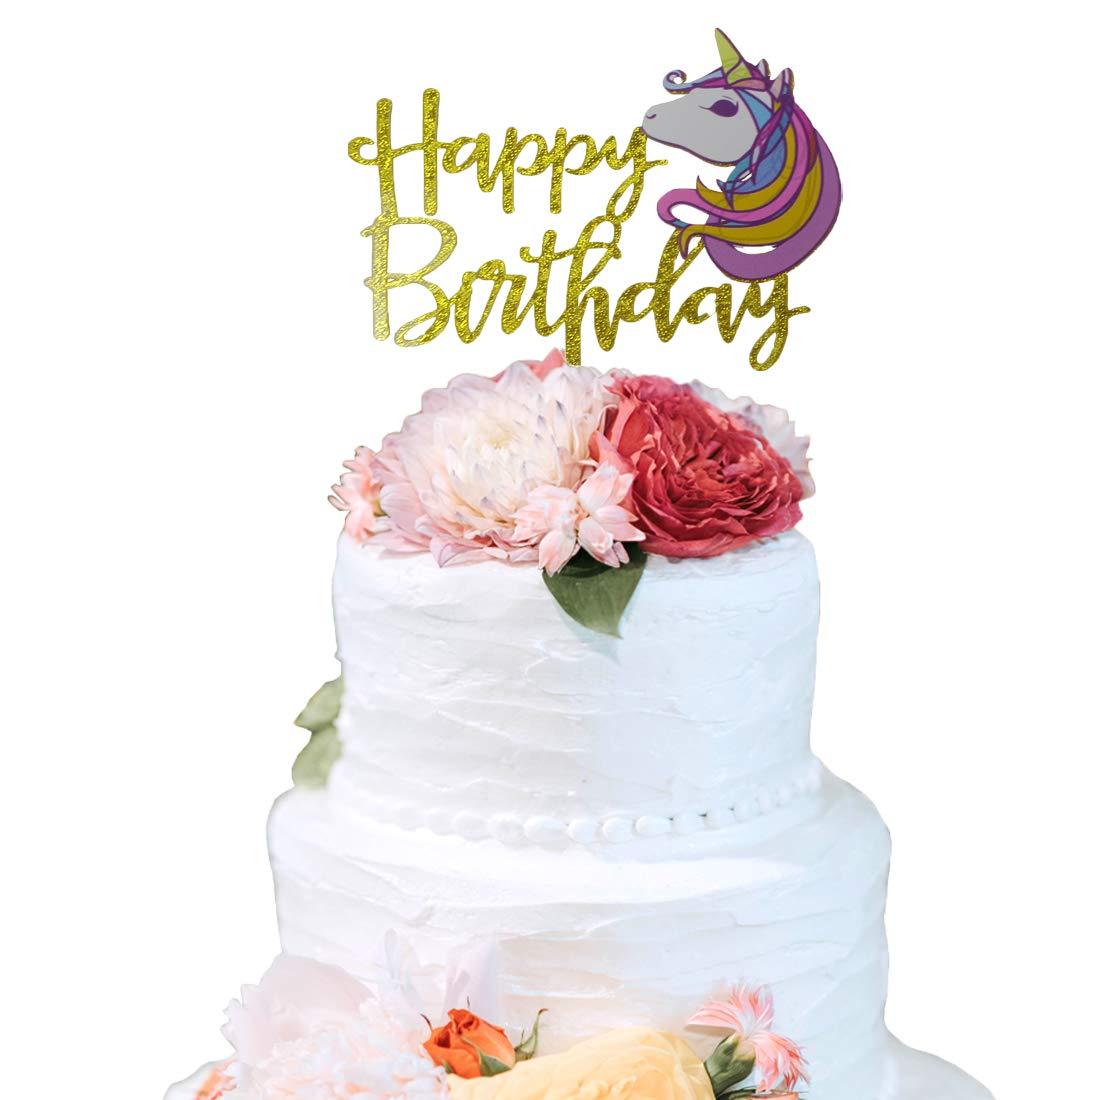 Unicorn Happy Birthday Cake Topper Handmade For Party Decoration SuppliesUnicorn Themed DecorationBaby Shower Amazon